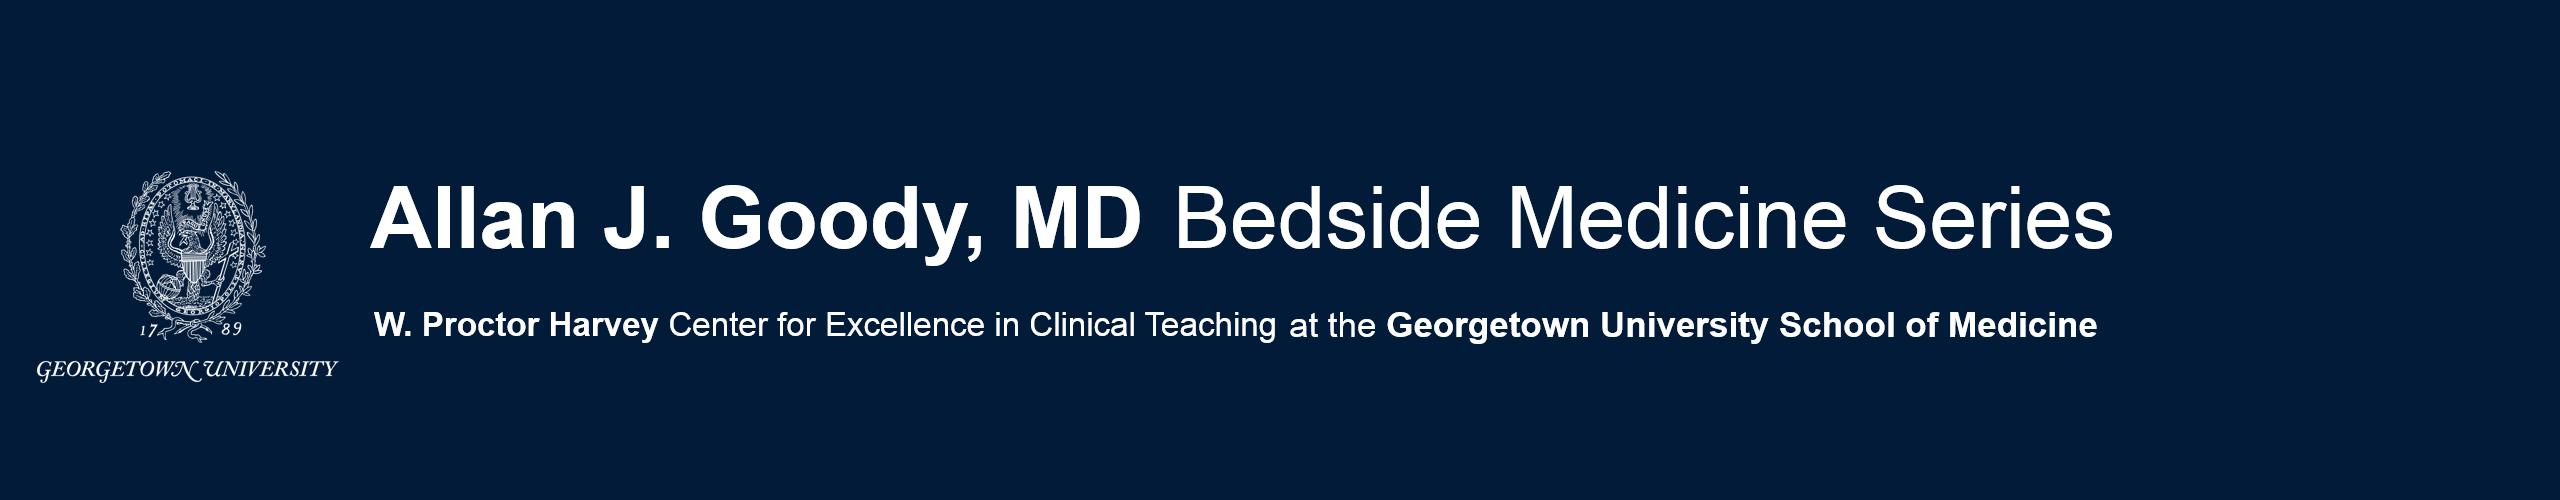 Allan J. Goody Bedside Medicine Series